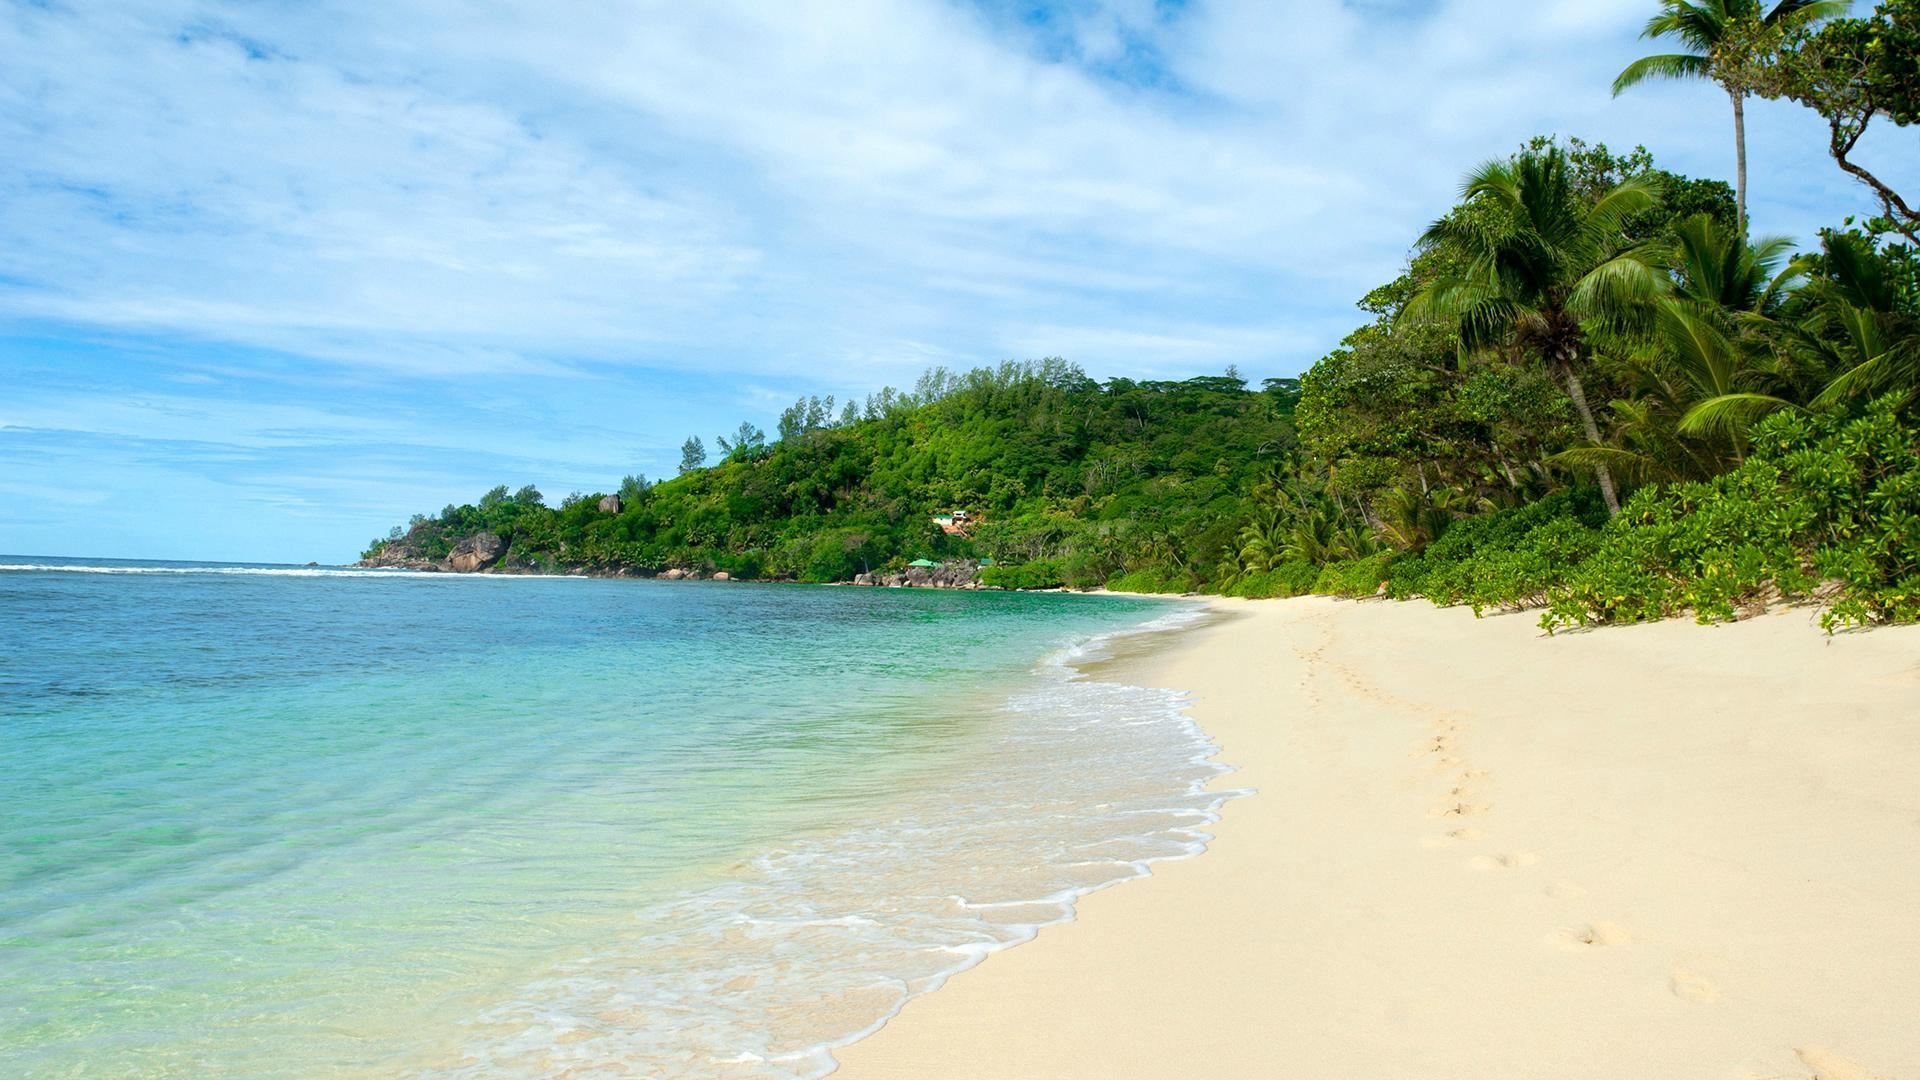 Kempinski Seychelles Resort